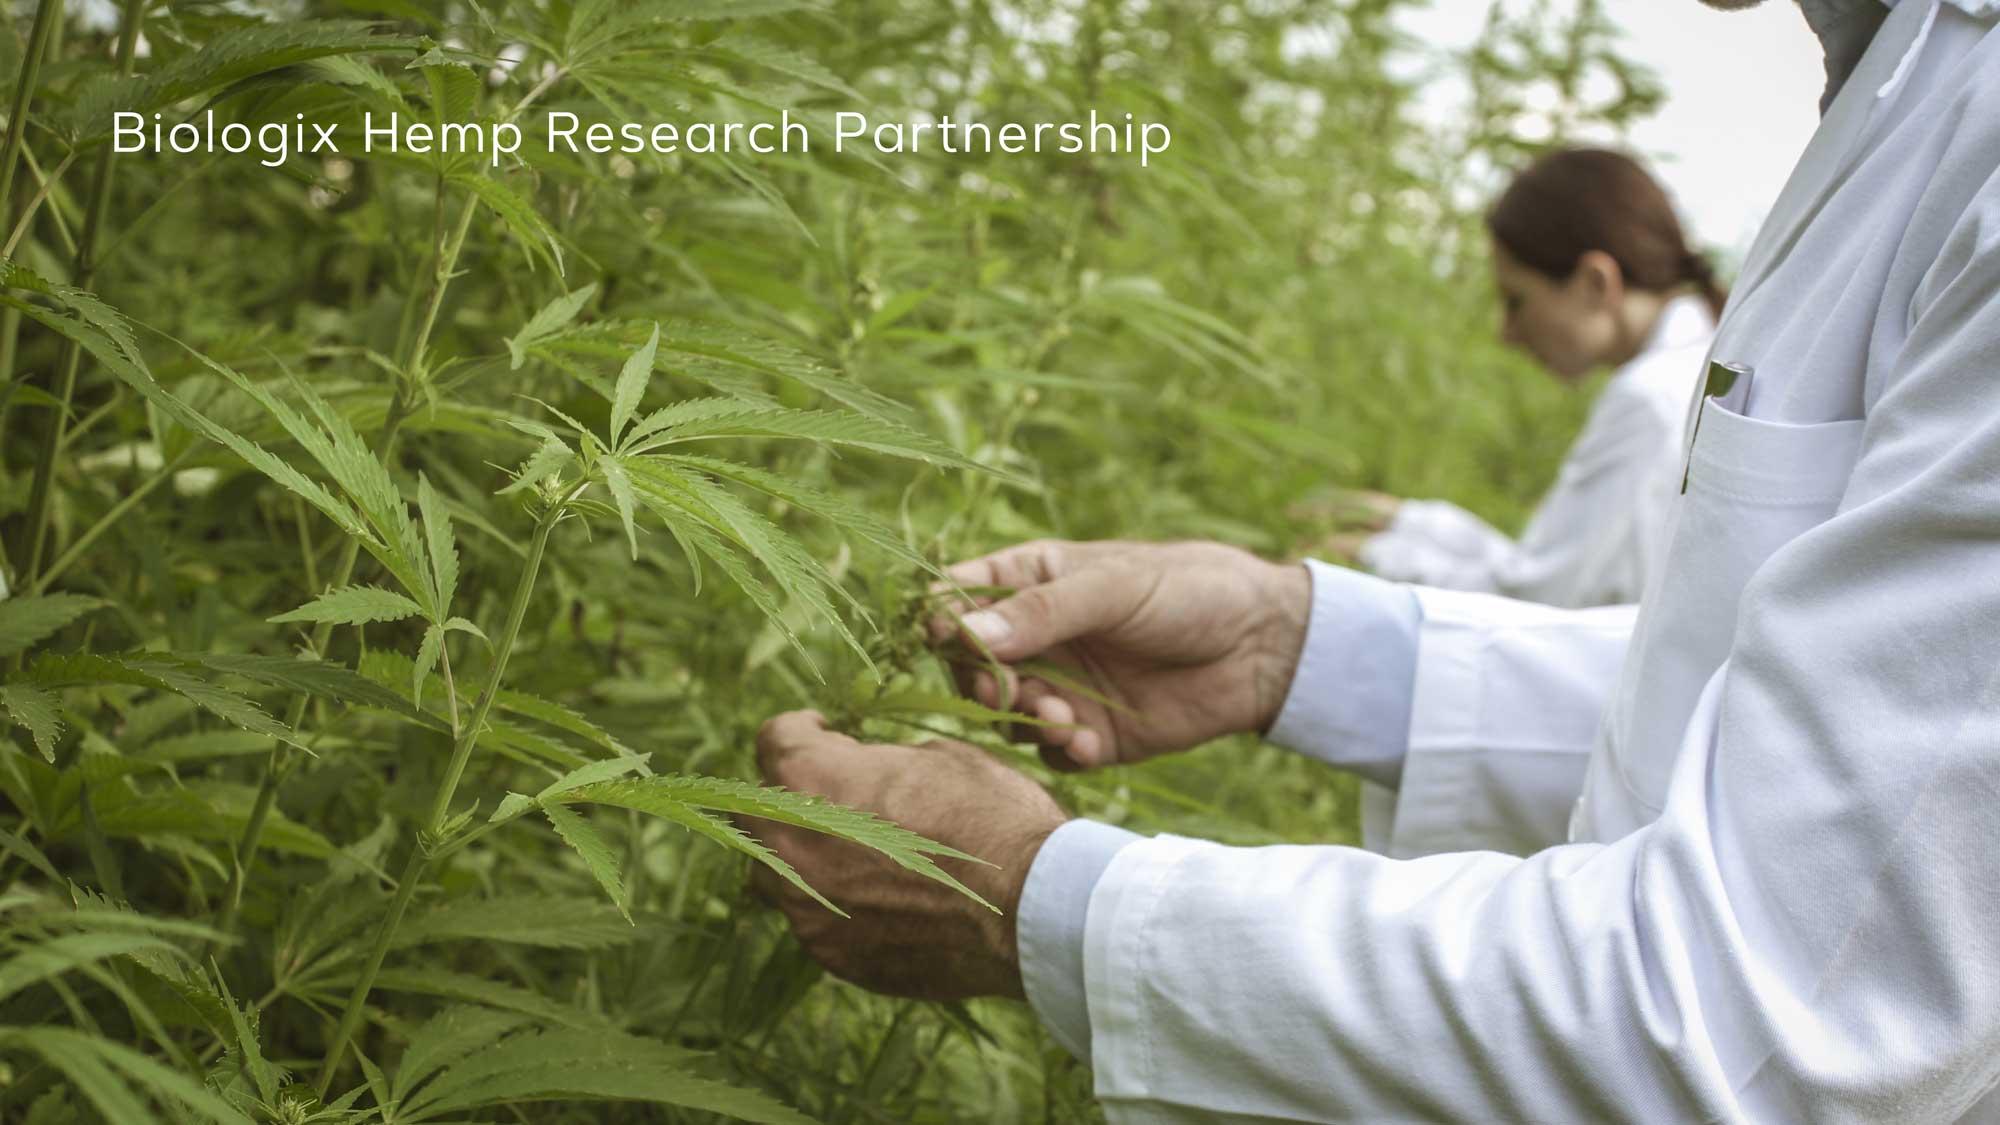 Biologix Hemp Research Partnership